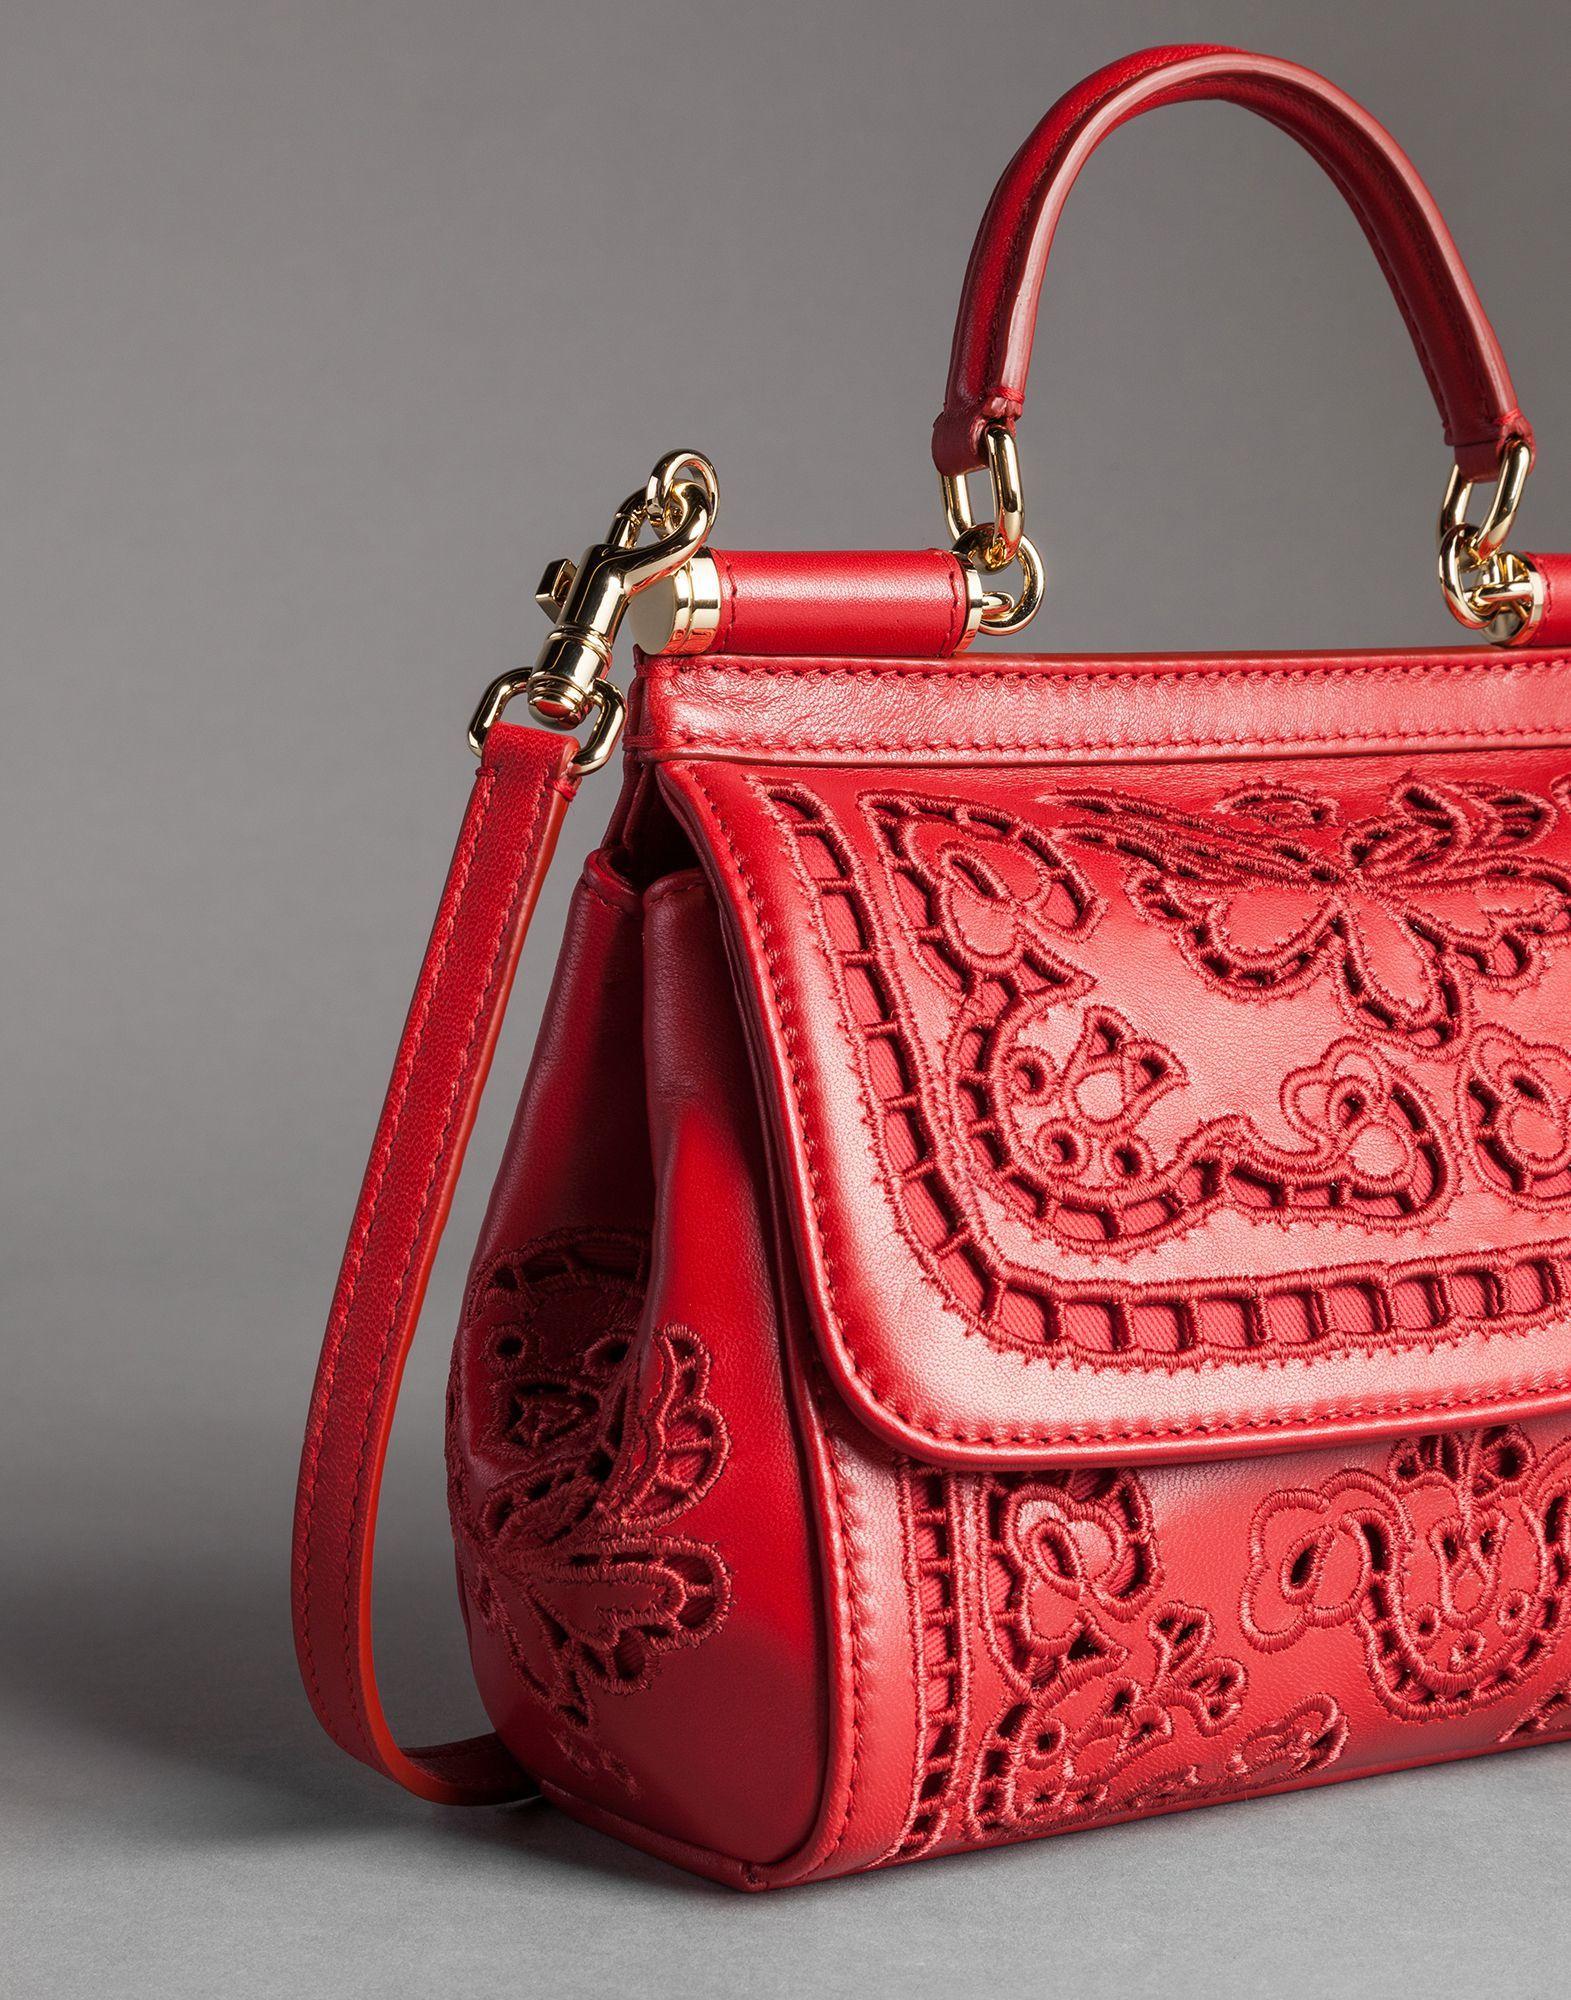 Sicily tote bag - Red Dolce & Gabbana tXRi99ZY4m